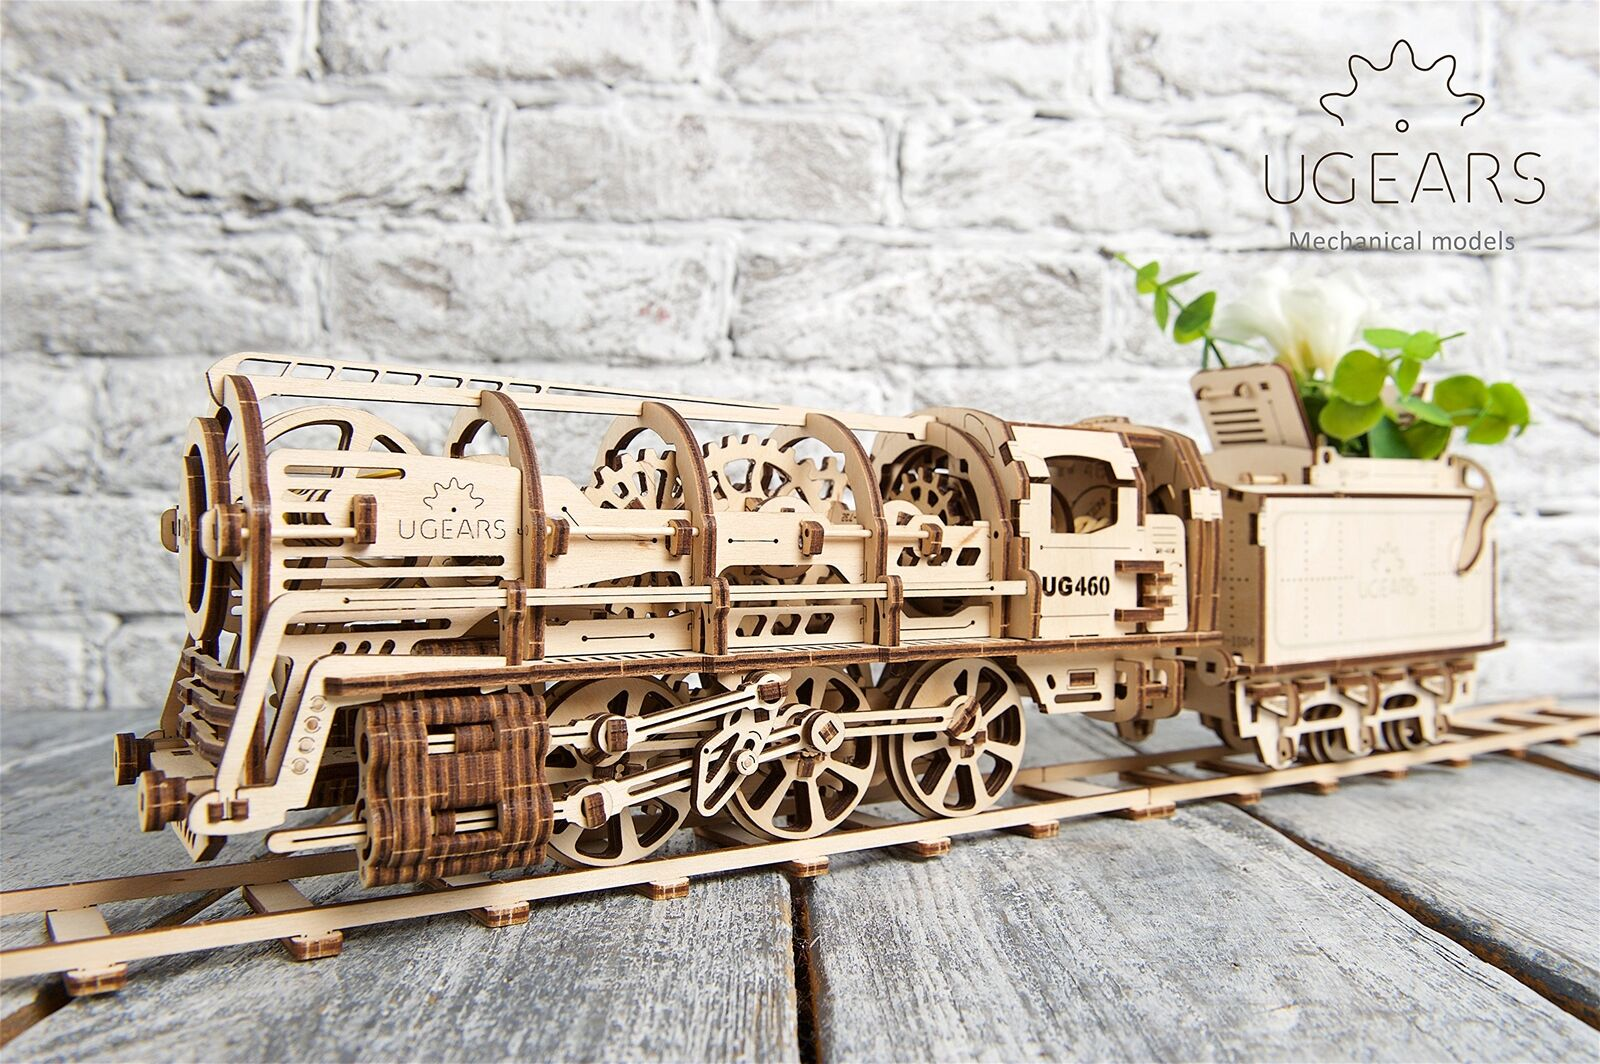 UGears Mechanical Models 3-D Wooden Puzzle - Mechanical Steam Locomotive Train